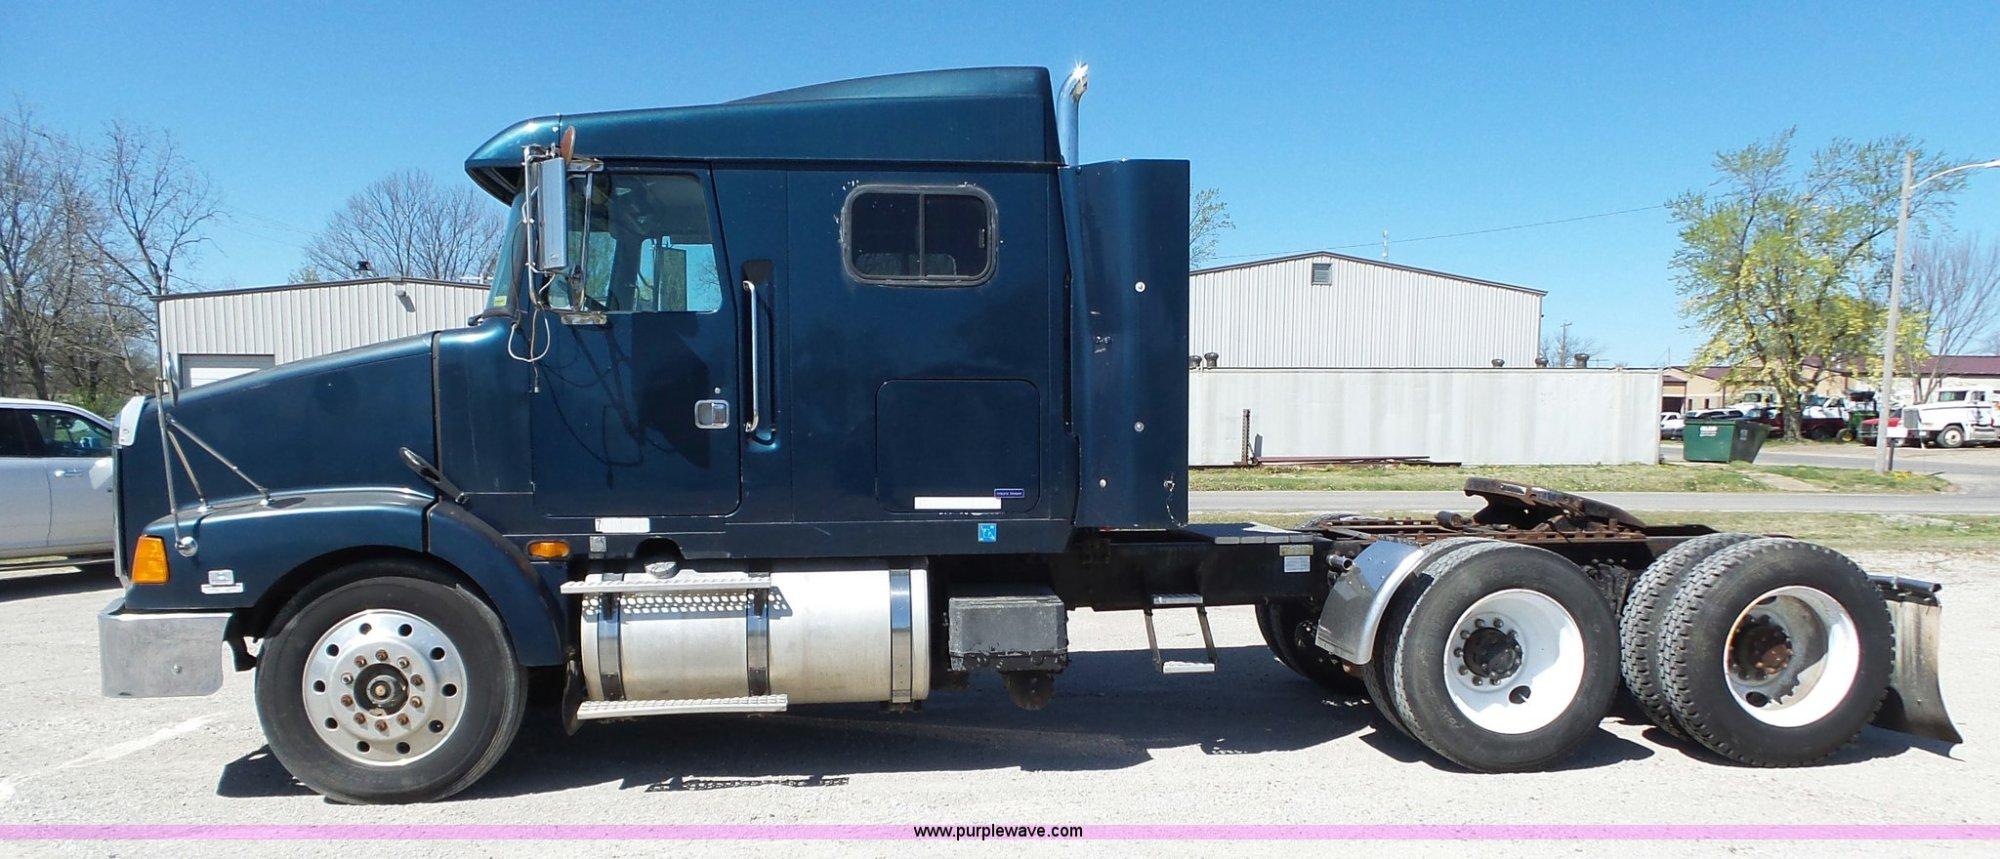 hight resolution of  1995 volvo wia semi truck full size in new window